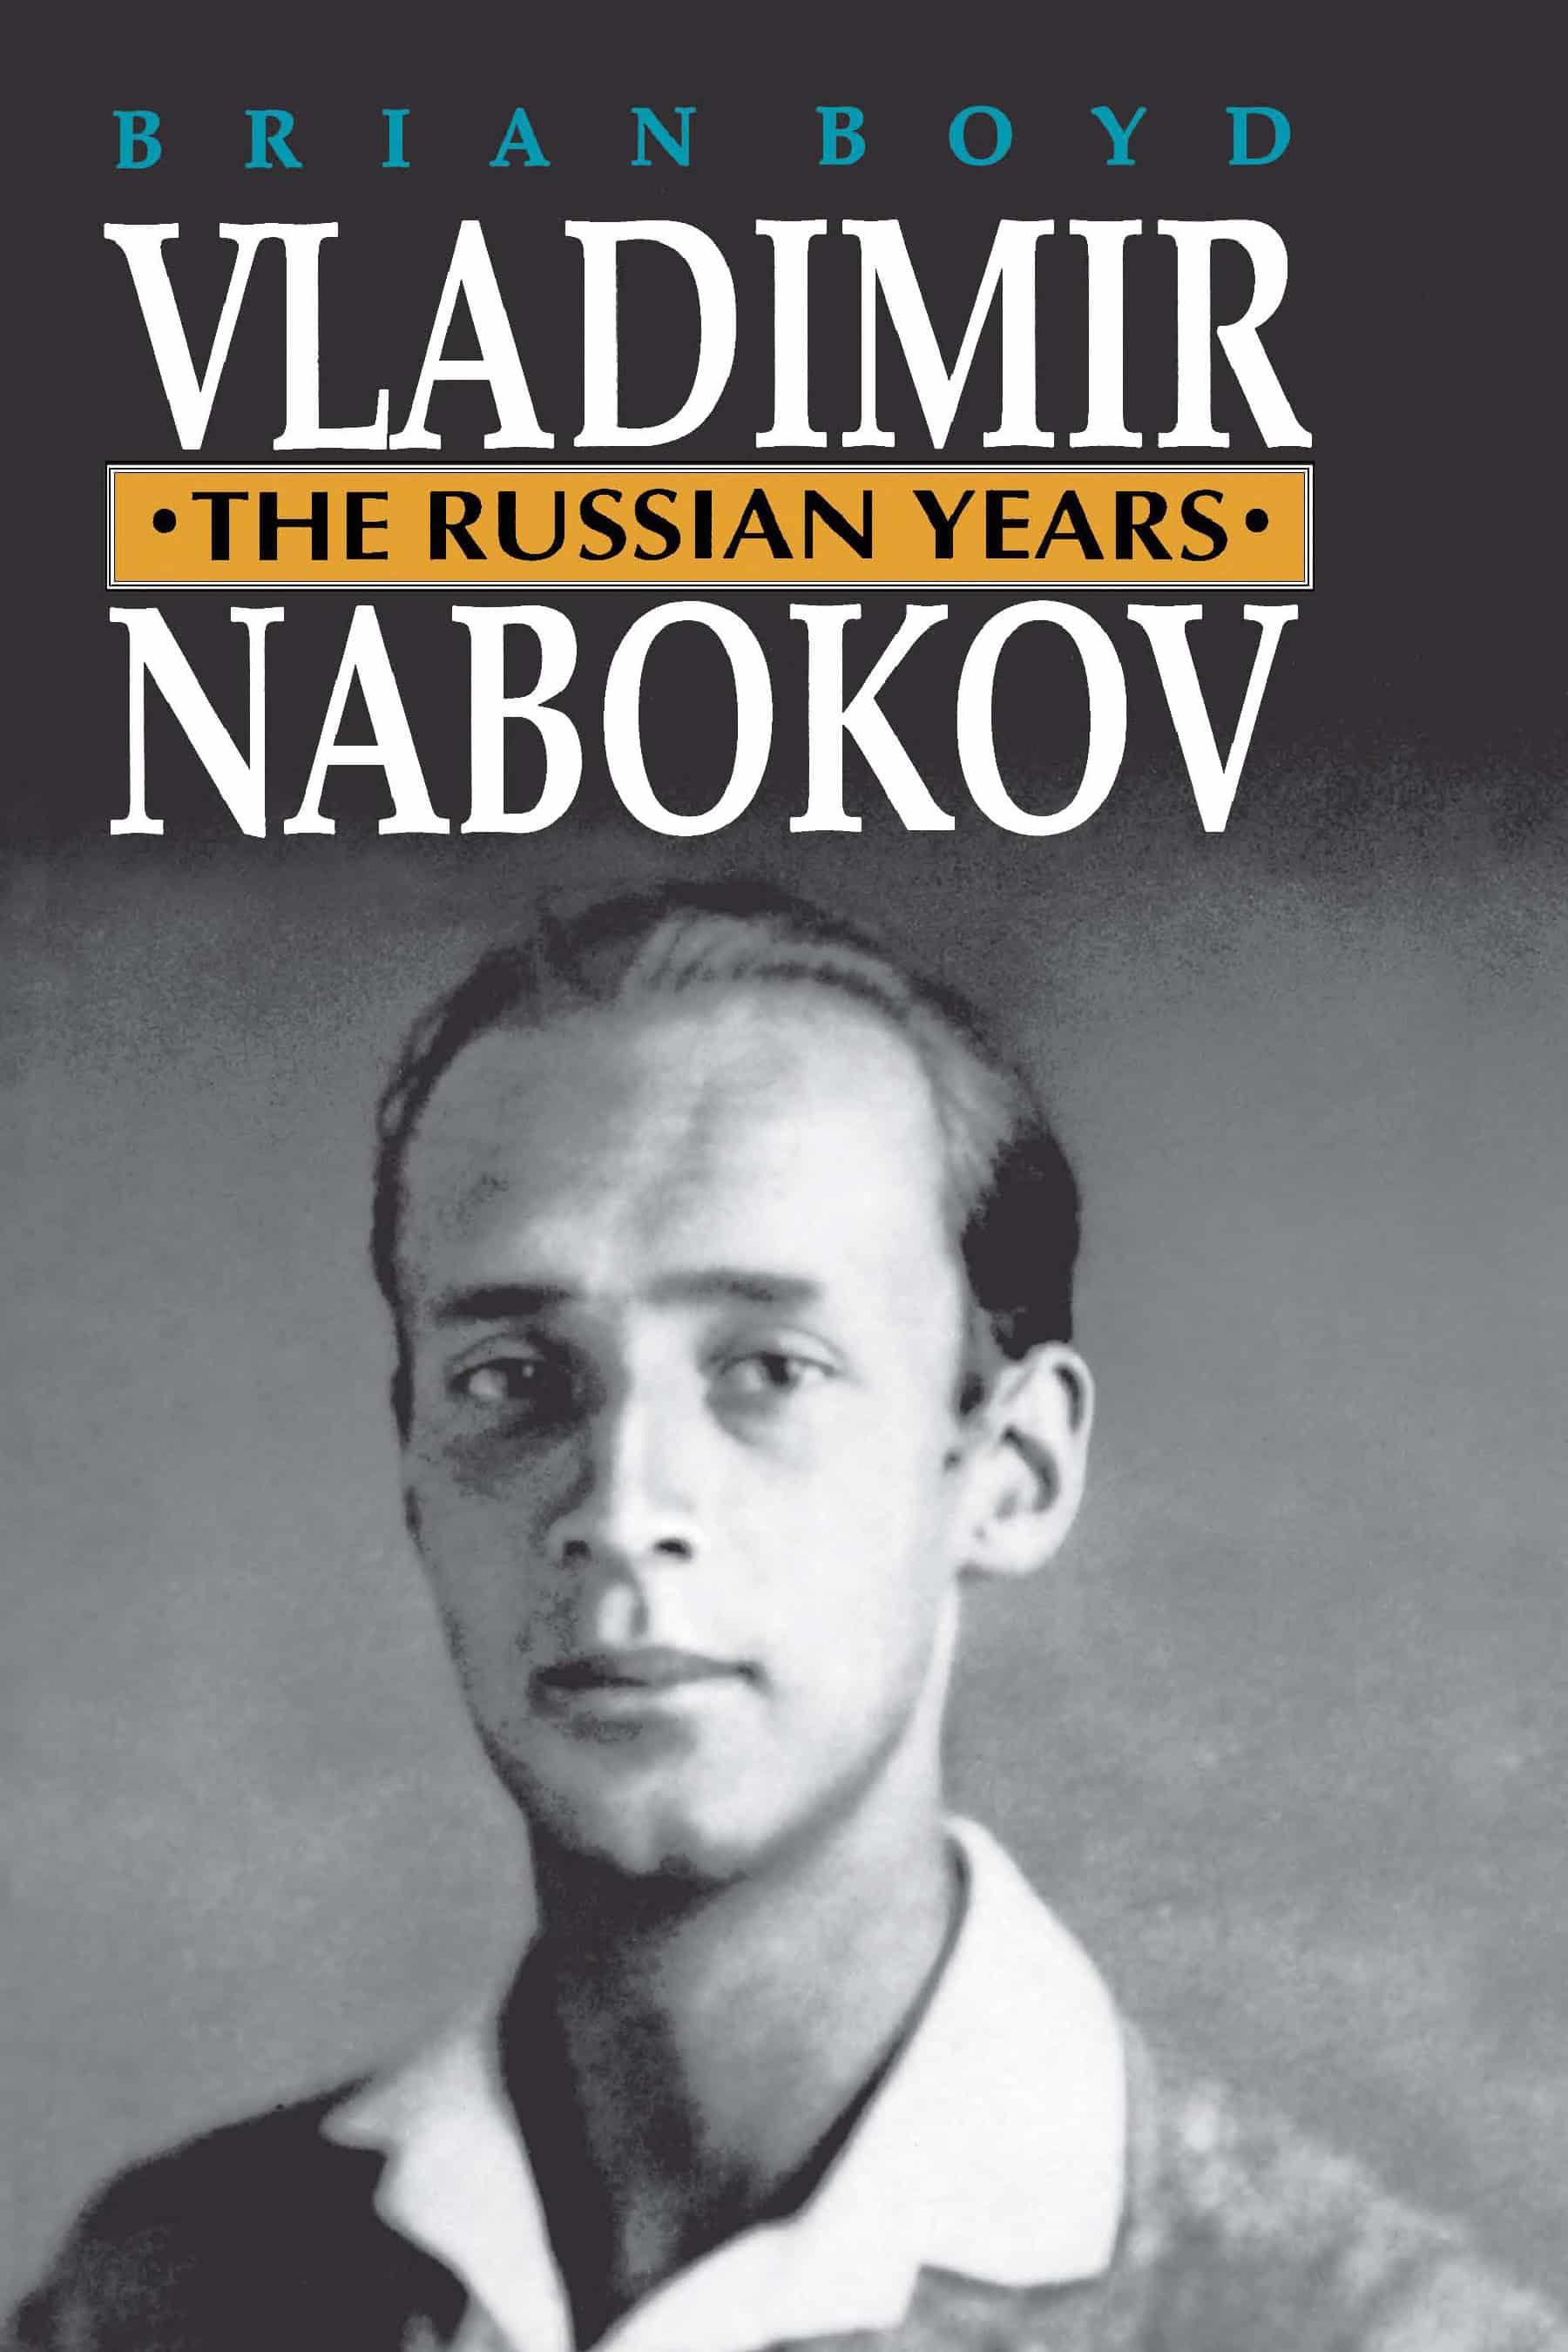 Vladimir Nabokov - Vladimir Nabokov: The Russian Years